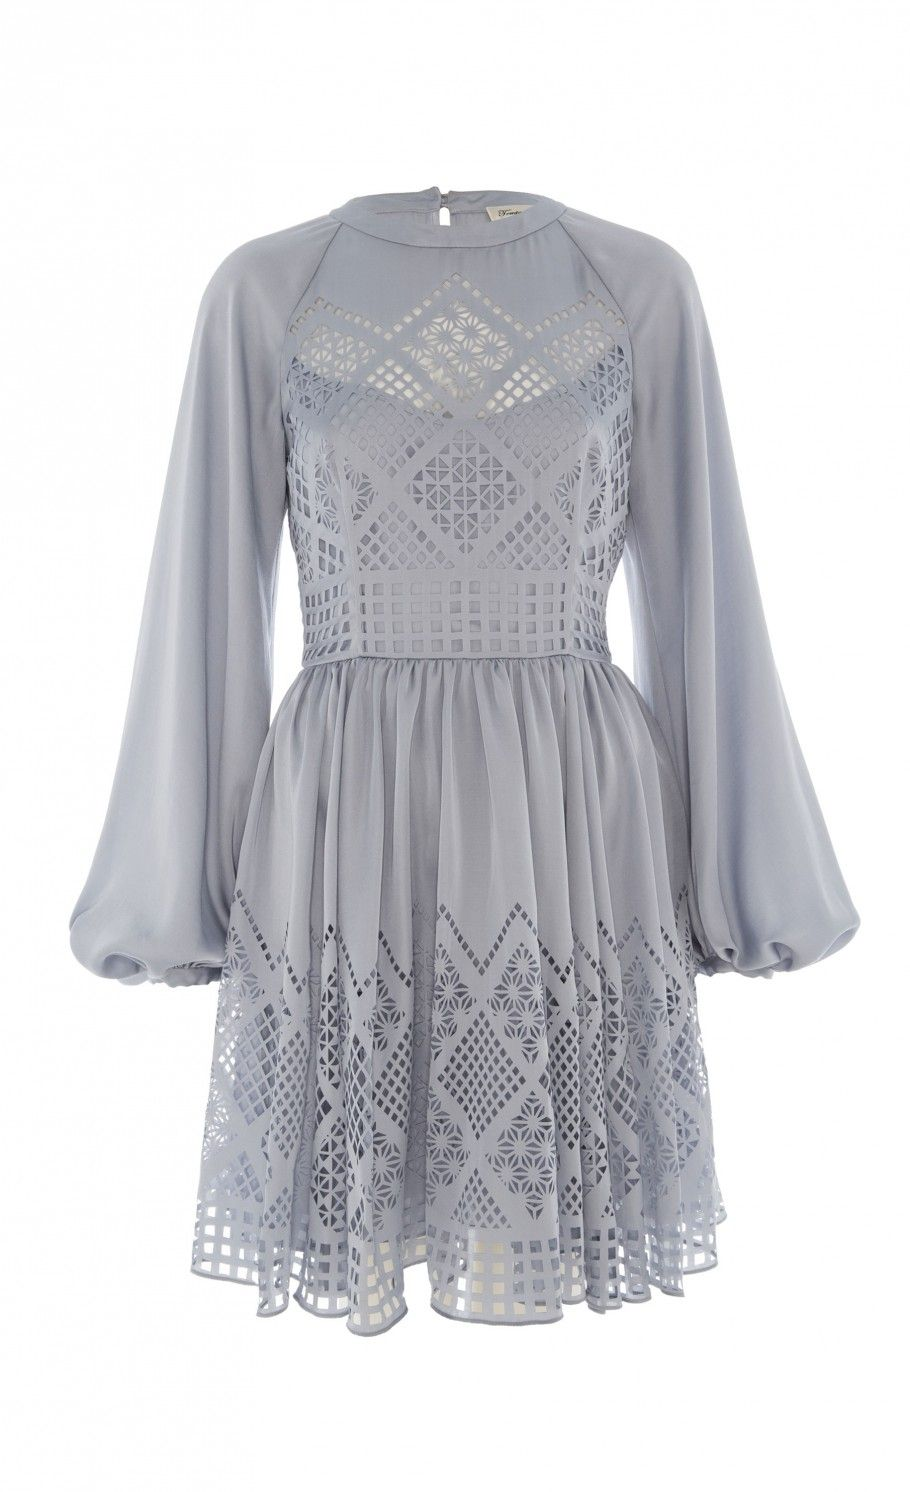 Temperley London Azure Long Sleeved Dress in Blue (Pale Blue)